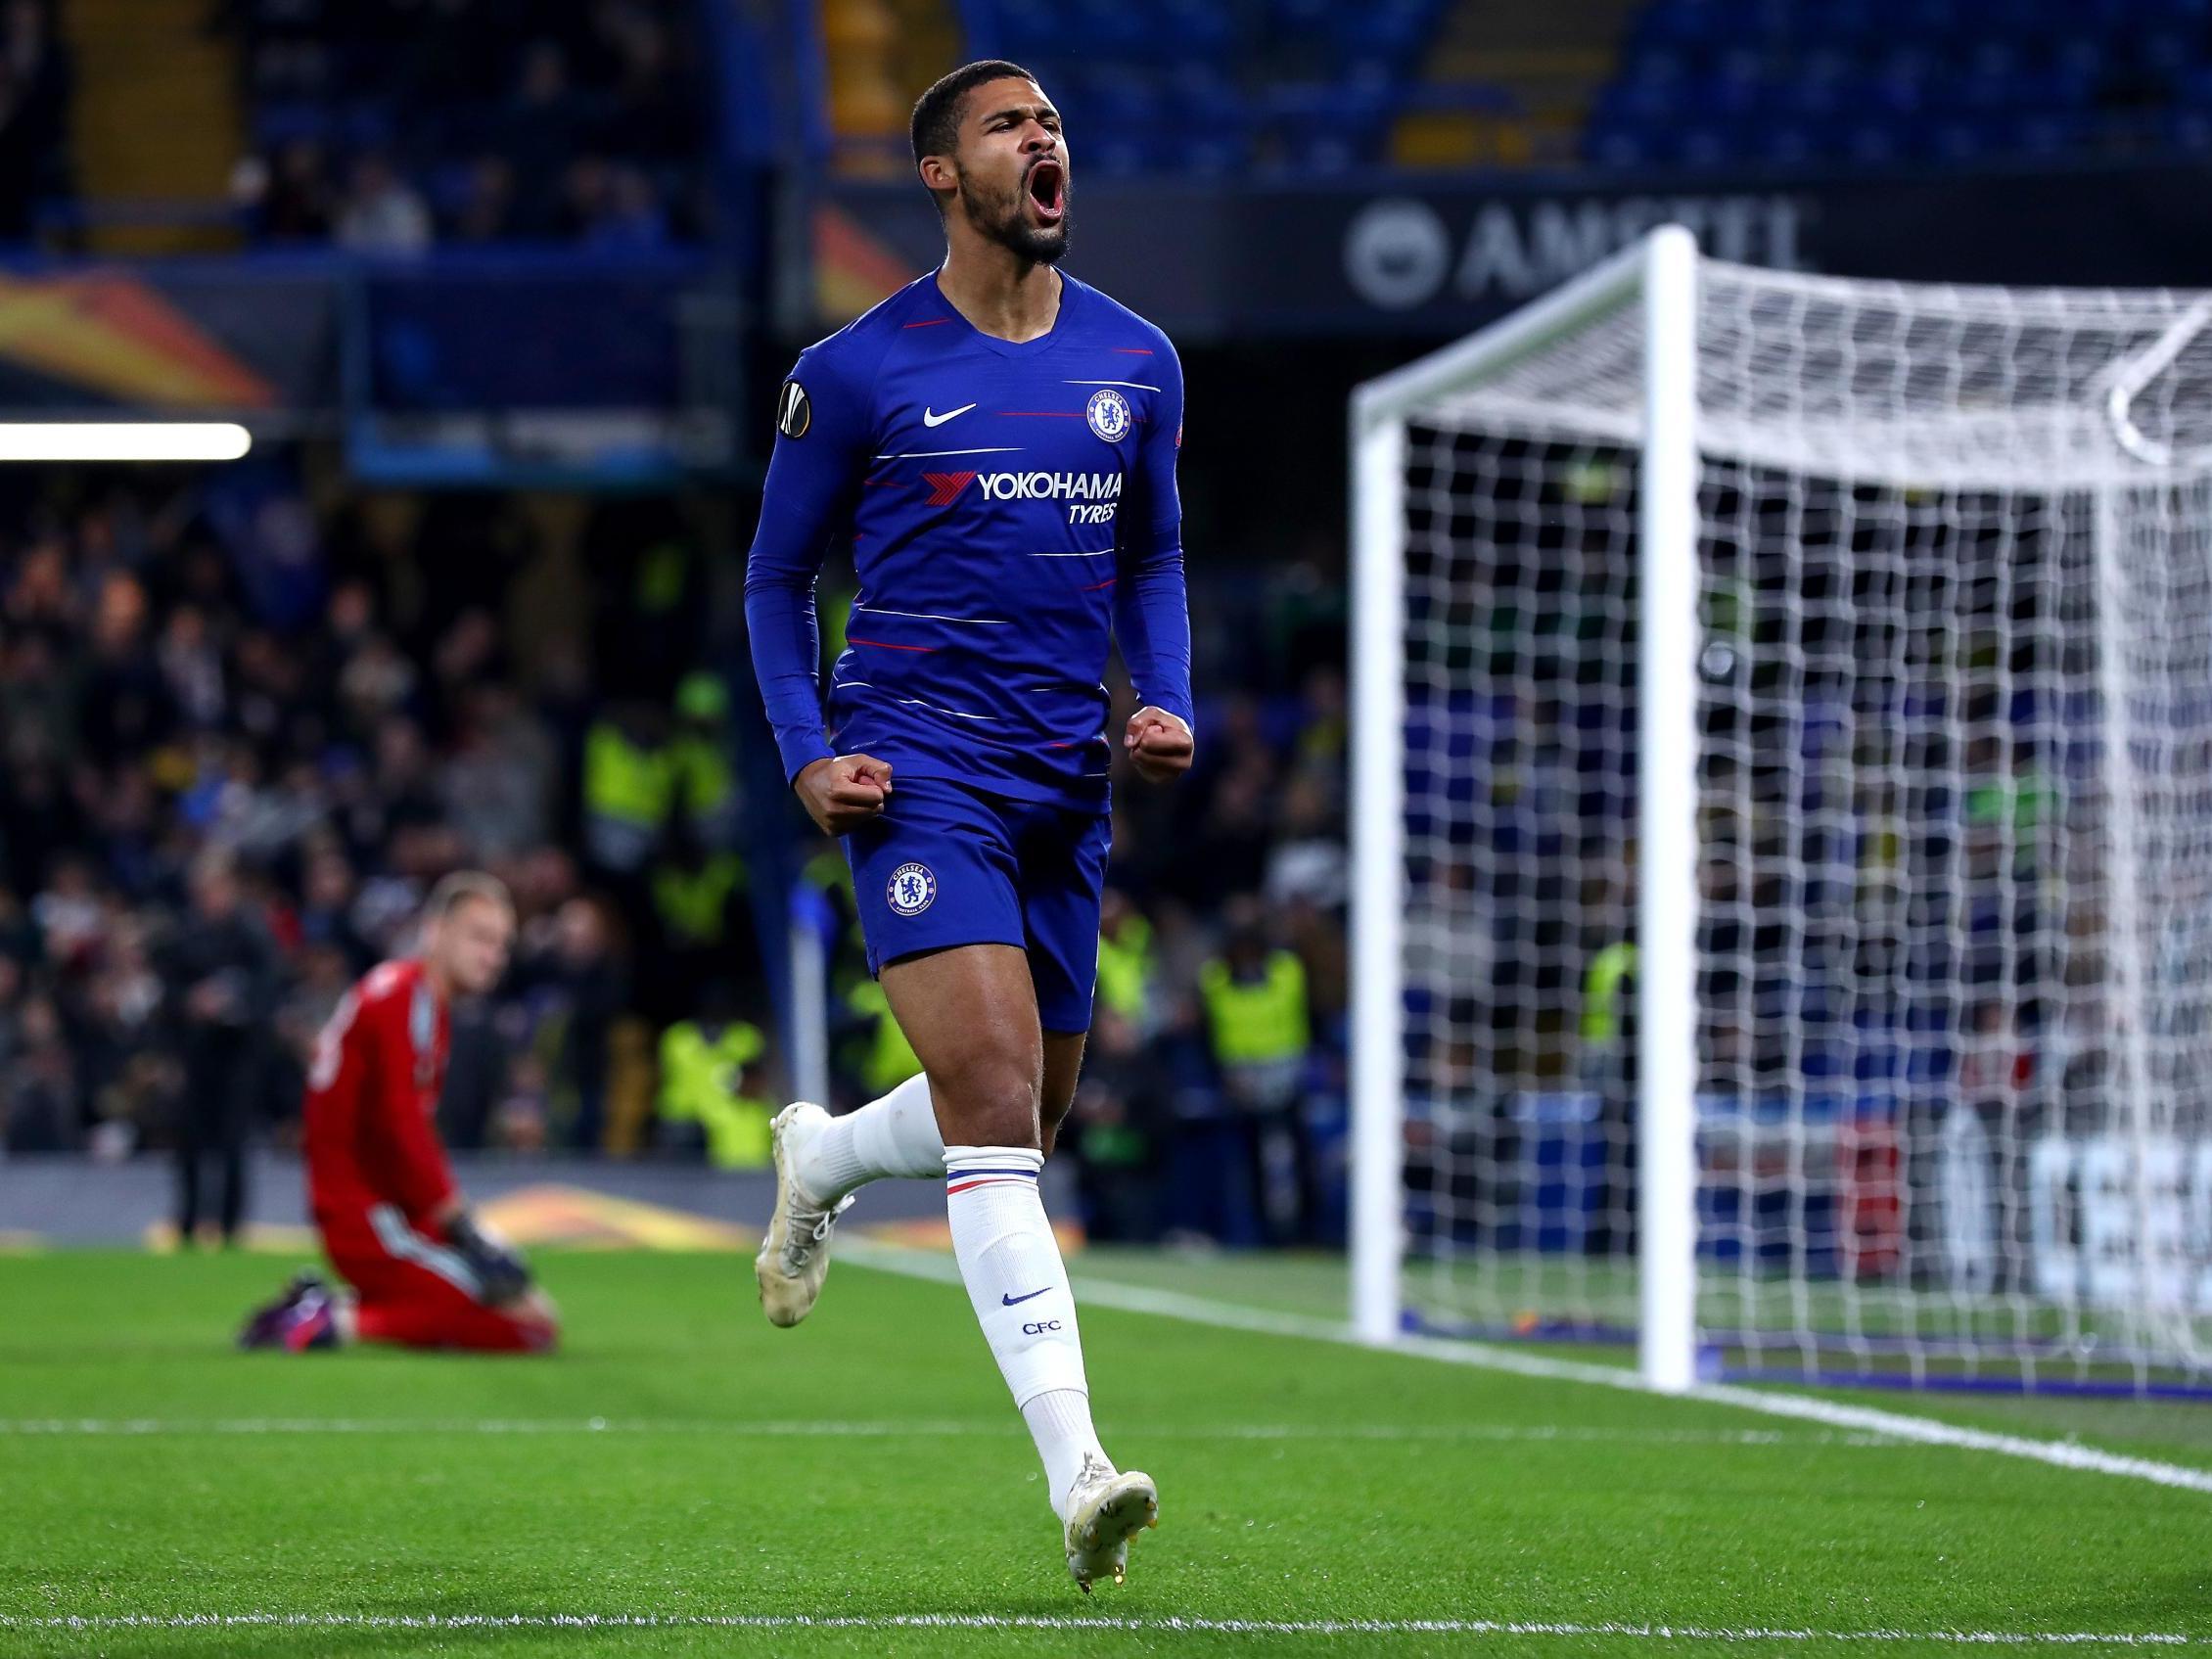 Ruben Loftus-Cheek masterclass inspires Chelsea to victory against BATE Borisov